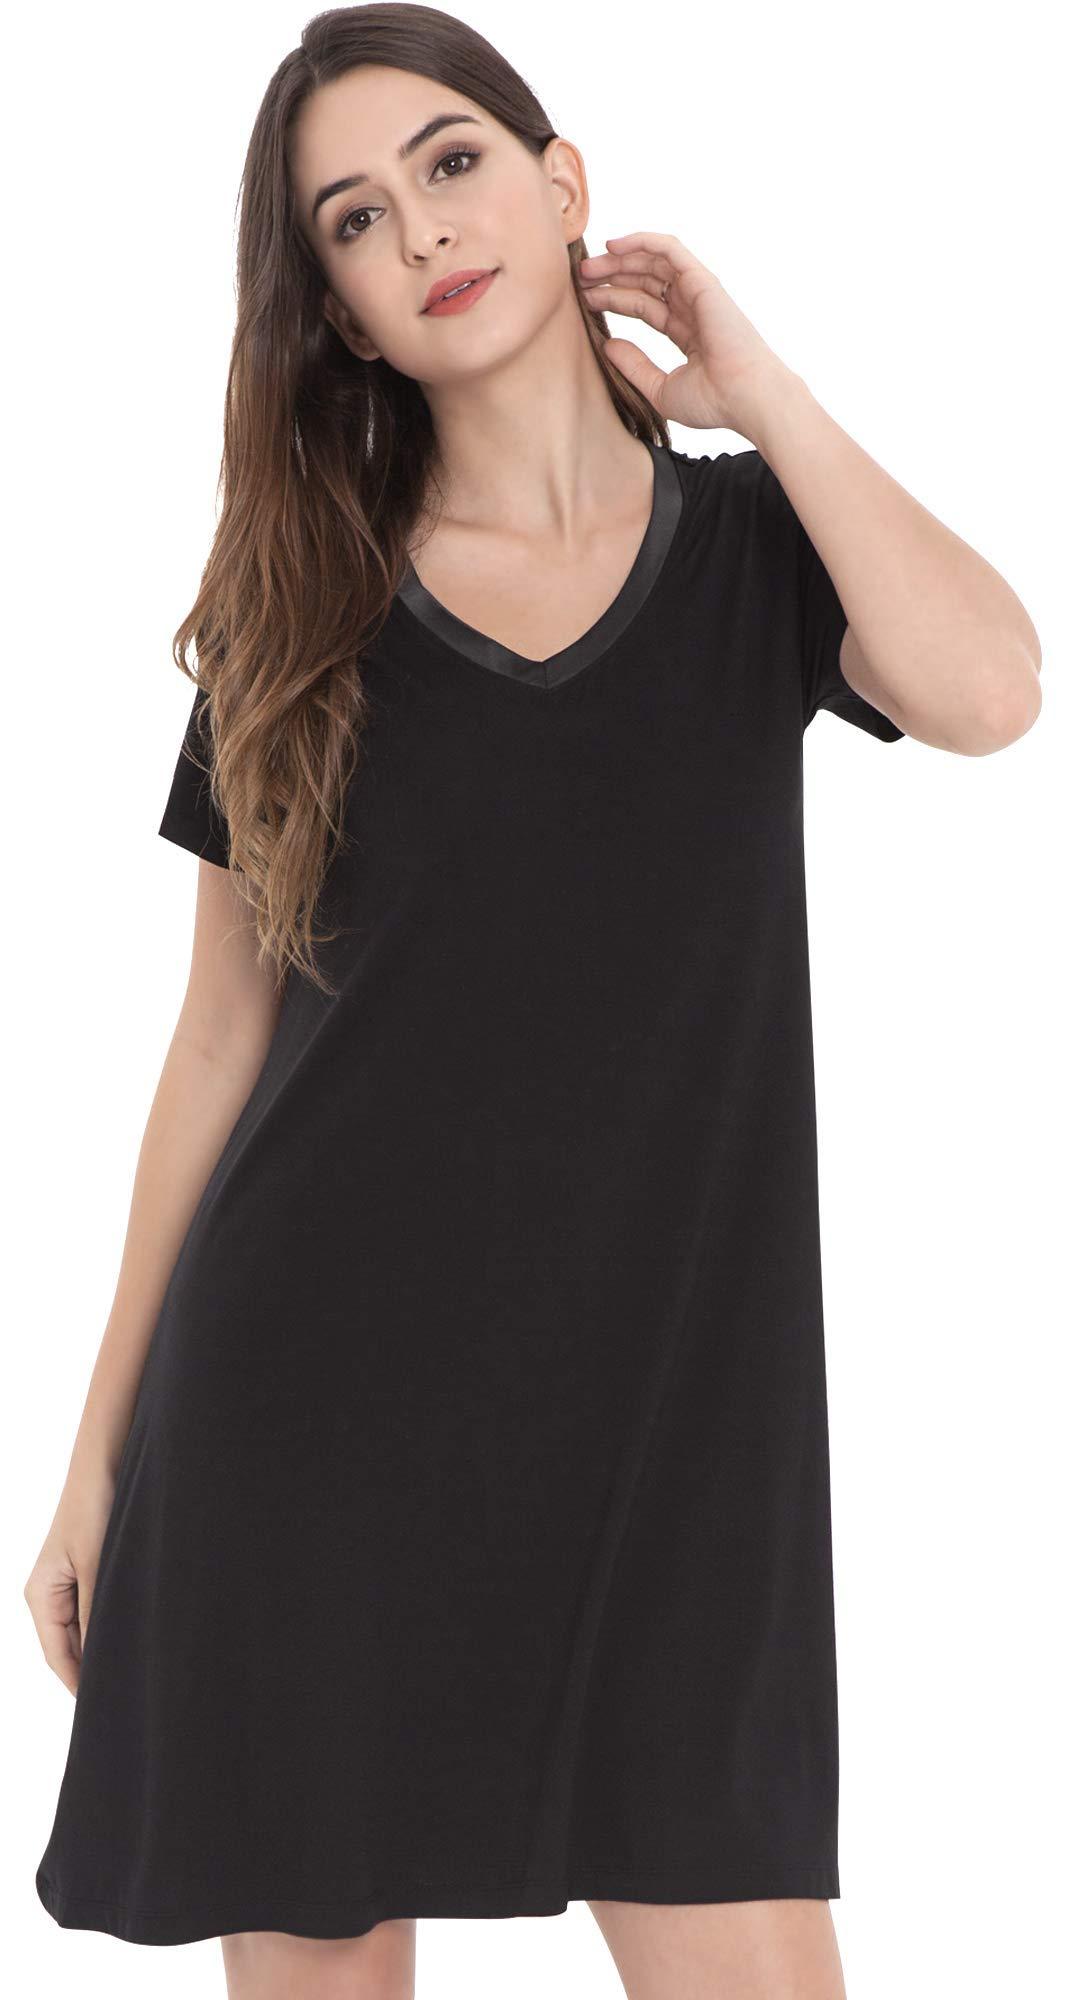 NEIWAI Women's Nightgowns Bamboo Sleep Shirt Short Sleeve Lounge Dress S-4X